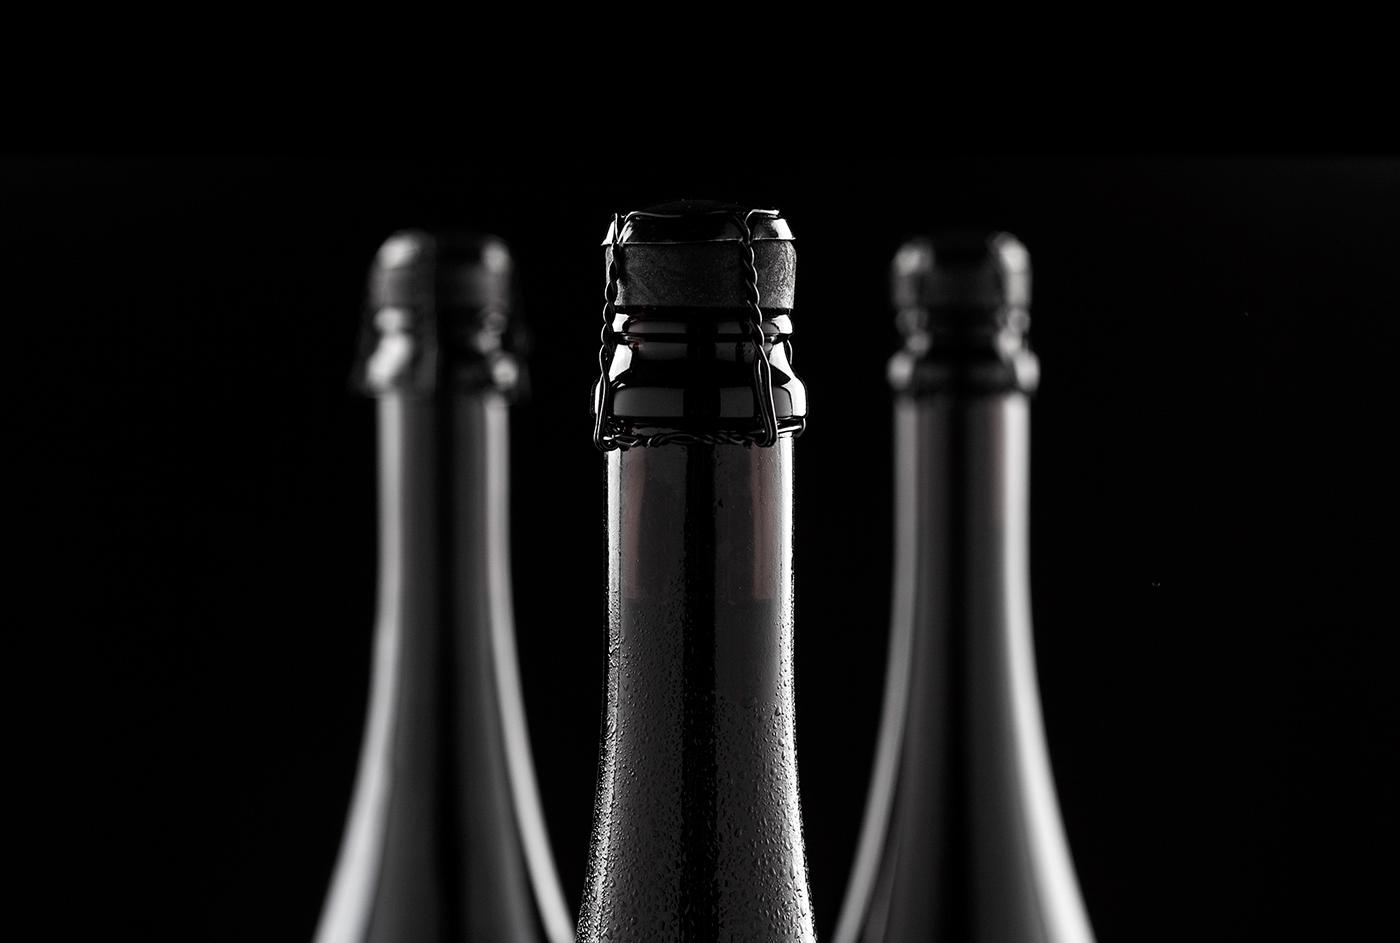 cerveza beer etiqueta Label squirrel brandsummit oak master glen oak organic ale brewery artesanal chipmunk alimentación